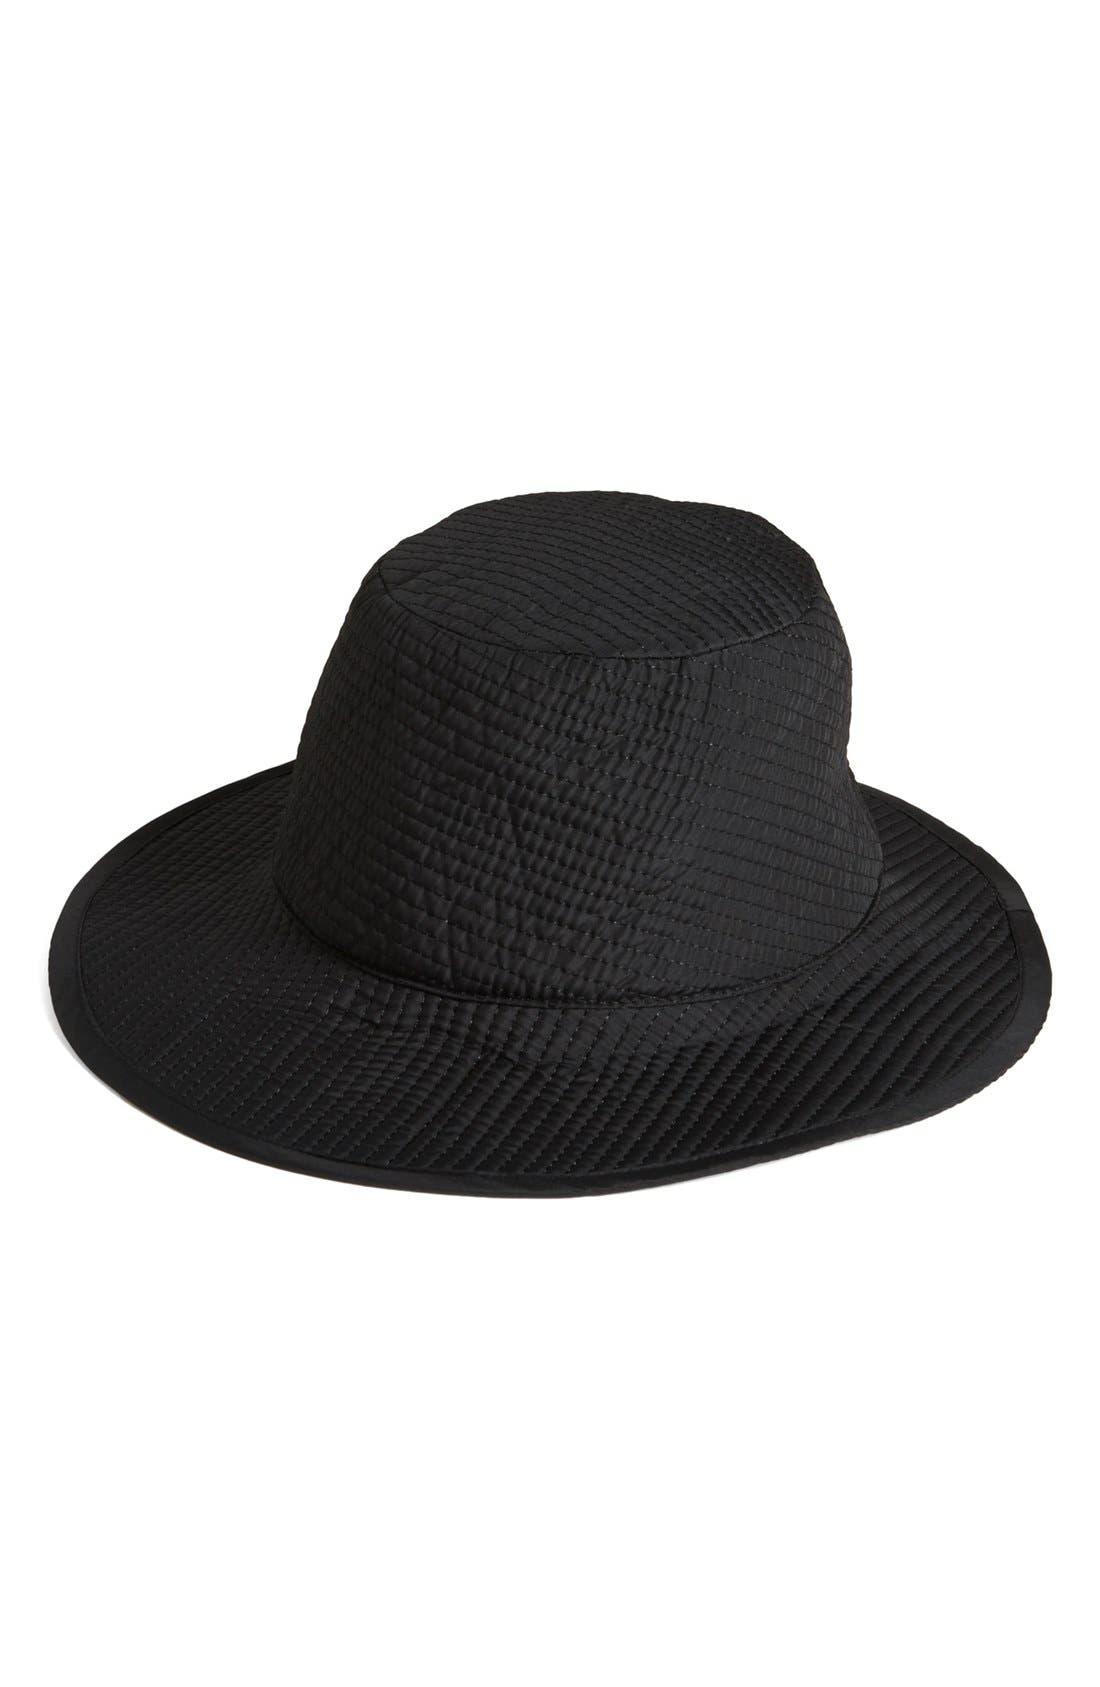 Rain Hat,                         Main,                         color, 001